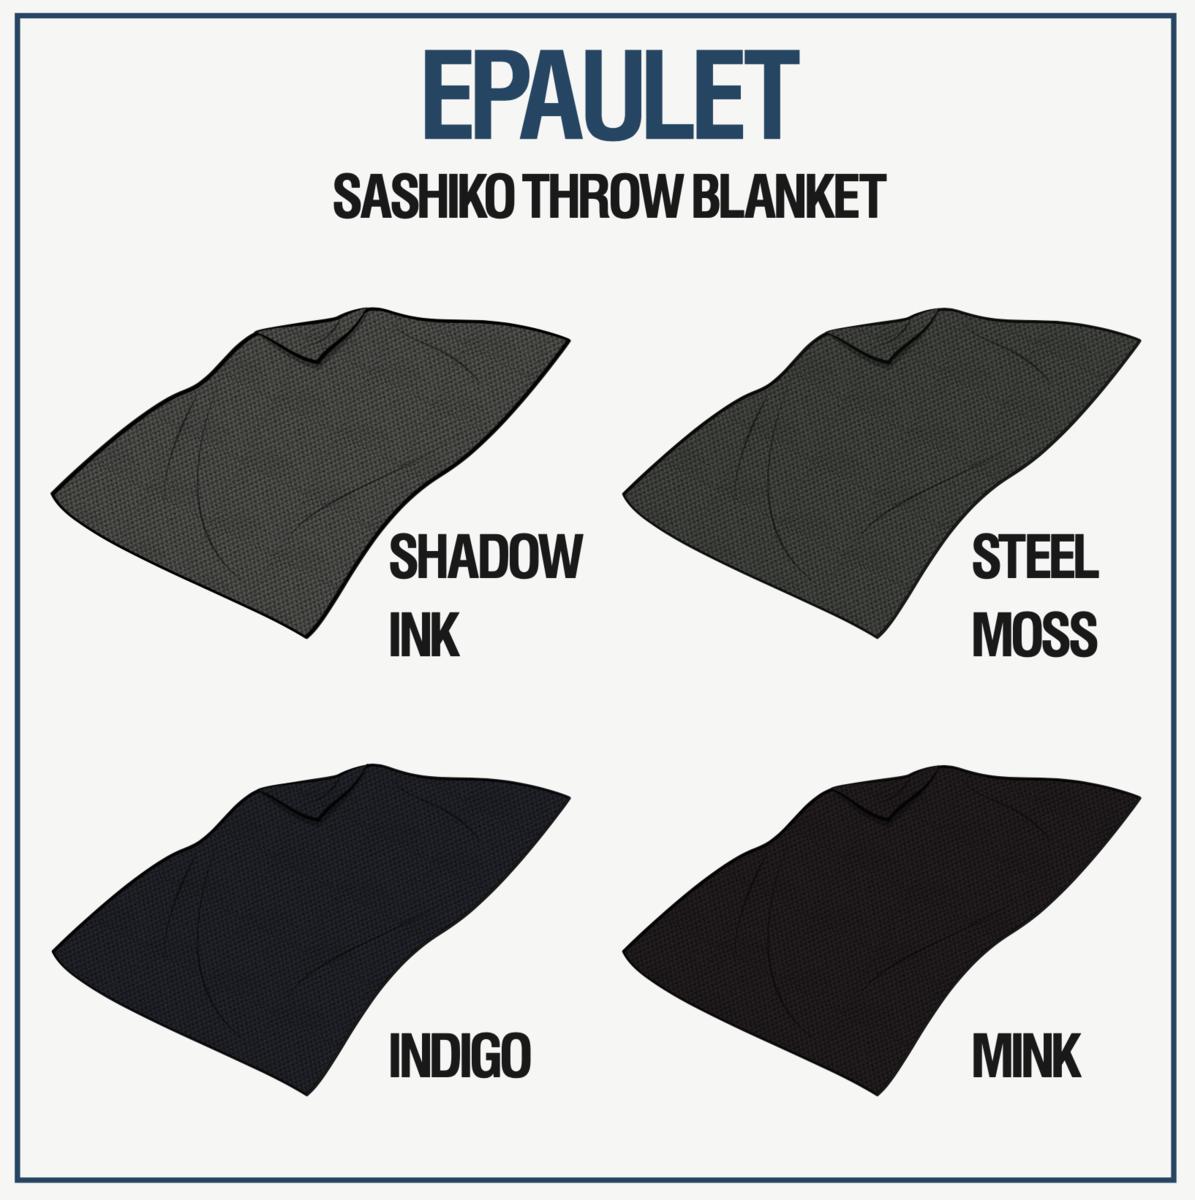 Sashiko Throw Blanket.png